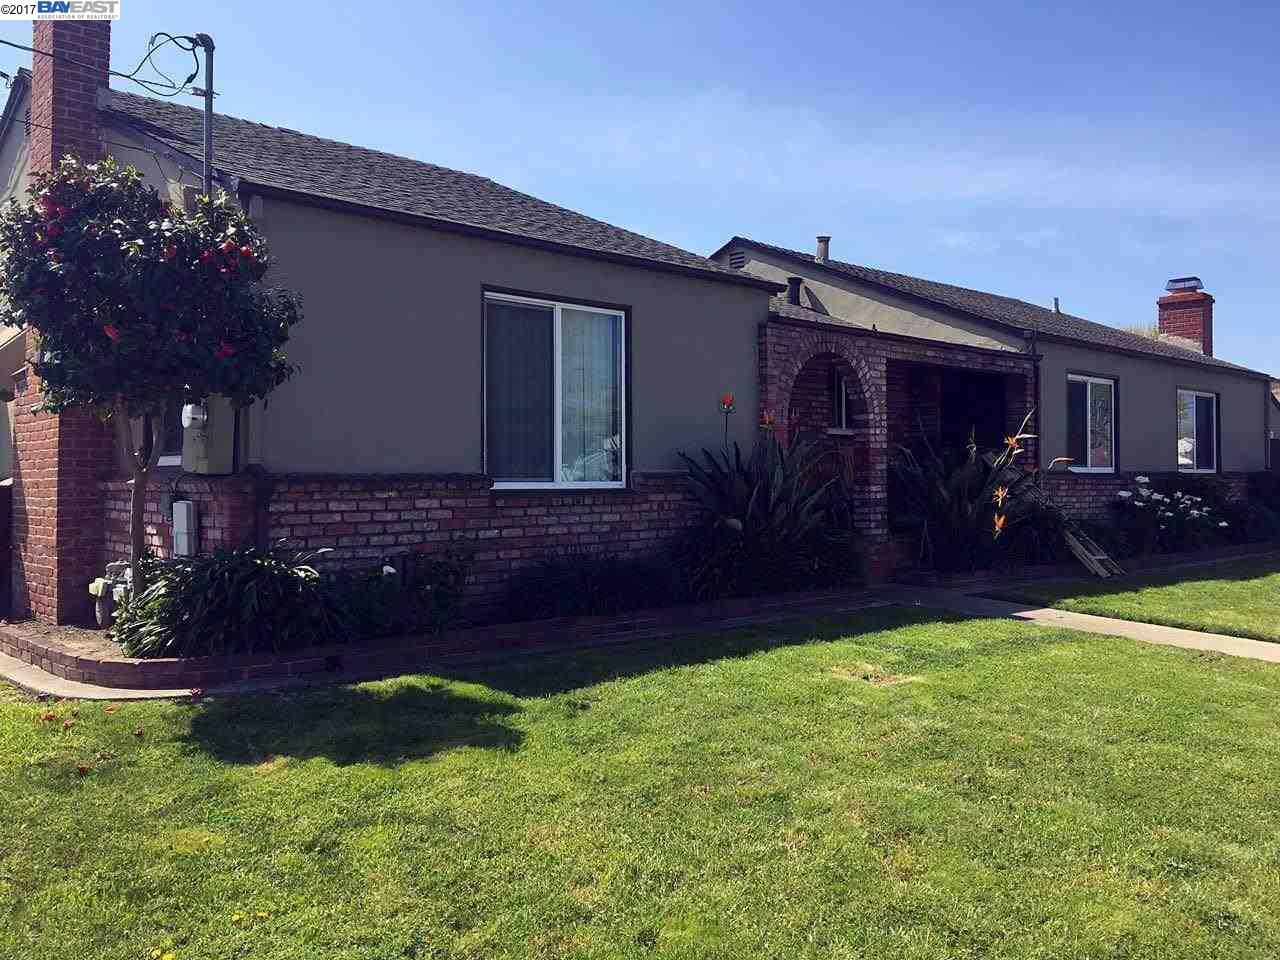 Multi-Family Home for Sale at 14367 Wake Avenue San Leandro, California 94578 United States